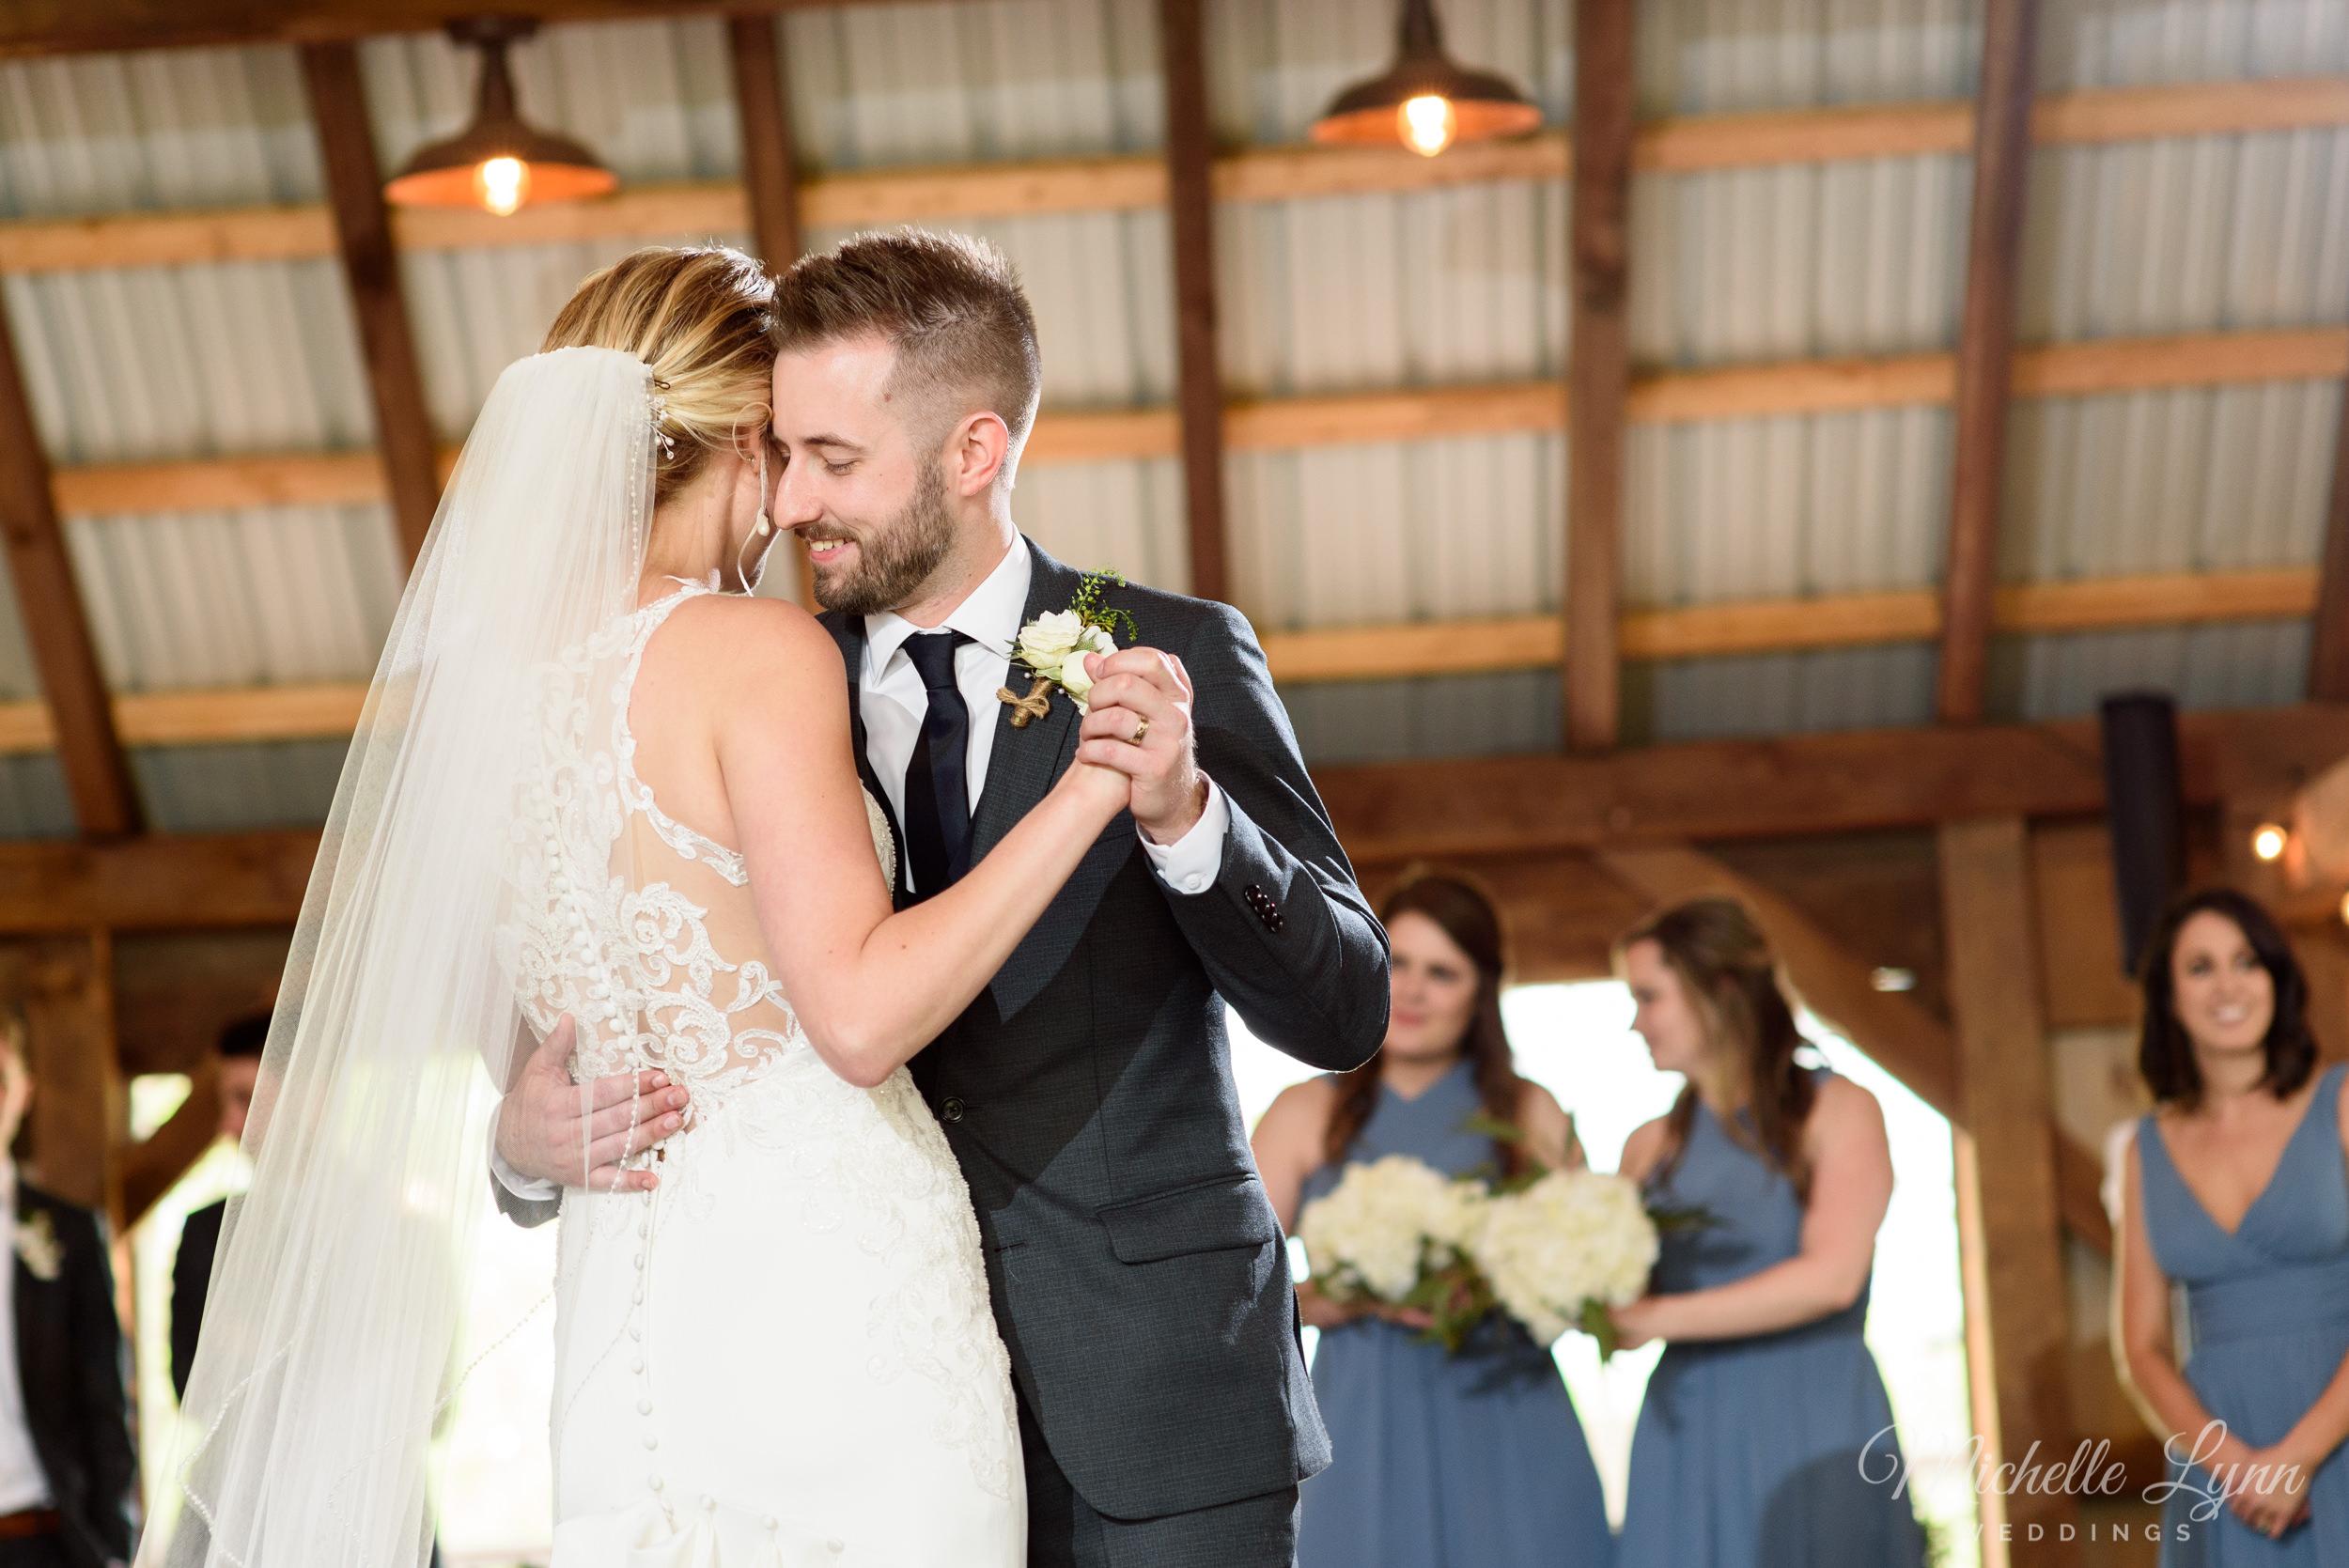 mlw-the-farm-bakery-and-events-wedding-photos-63.jpg